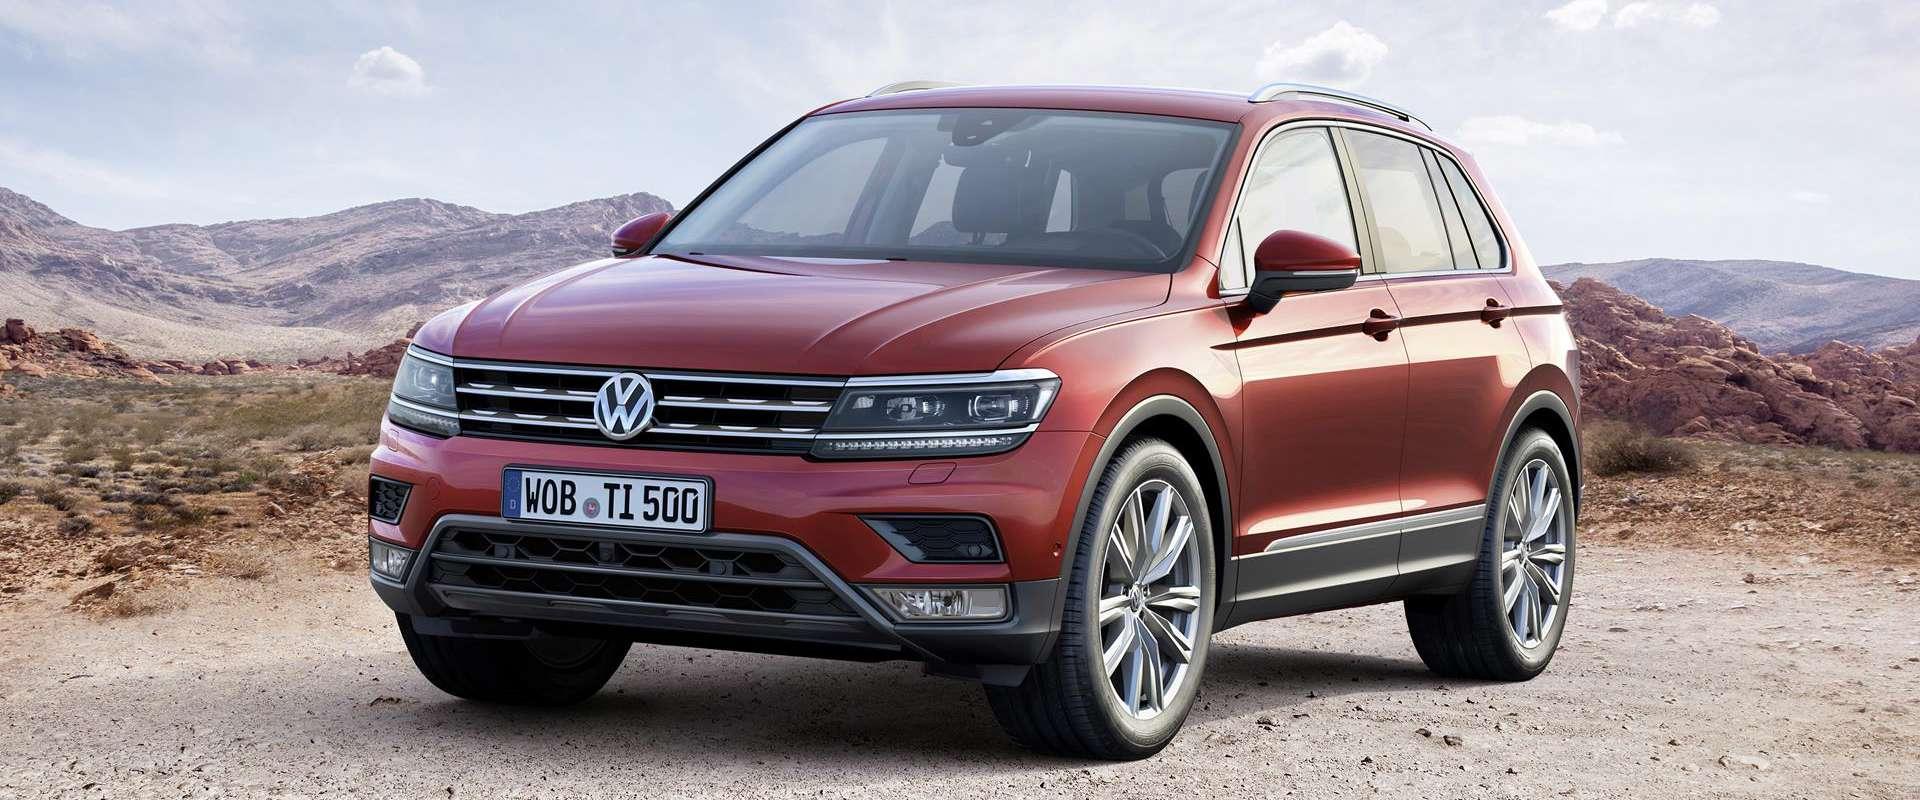 Svjetska premijera: Volkswagen Tiguan za 2016.